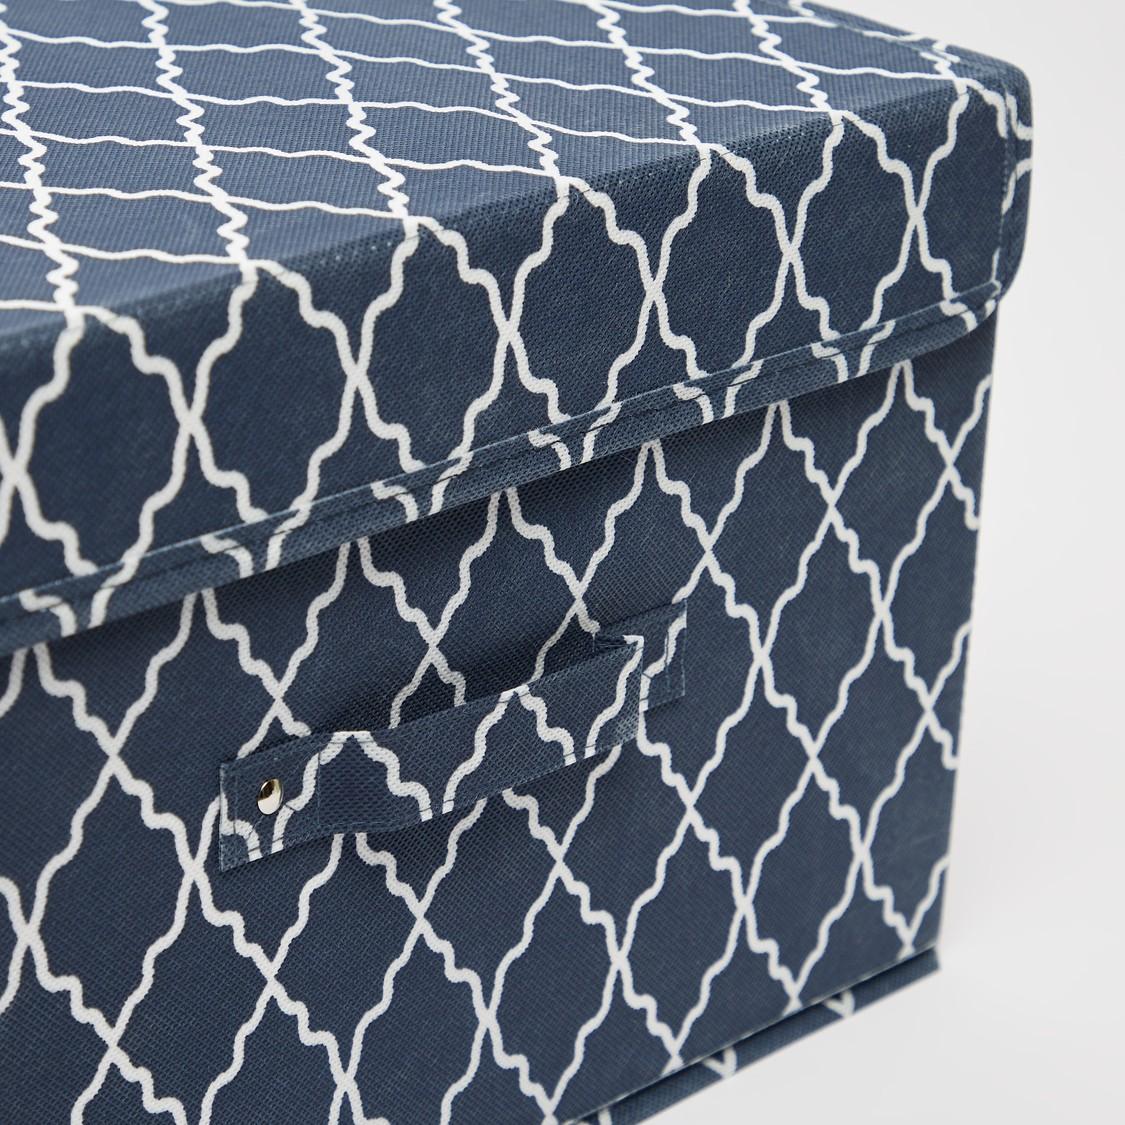 Printed Rectangular Storage Box with Handle - 38x25x25 cms